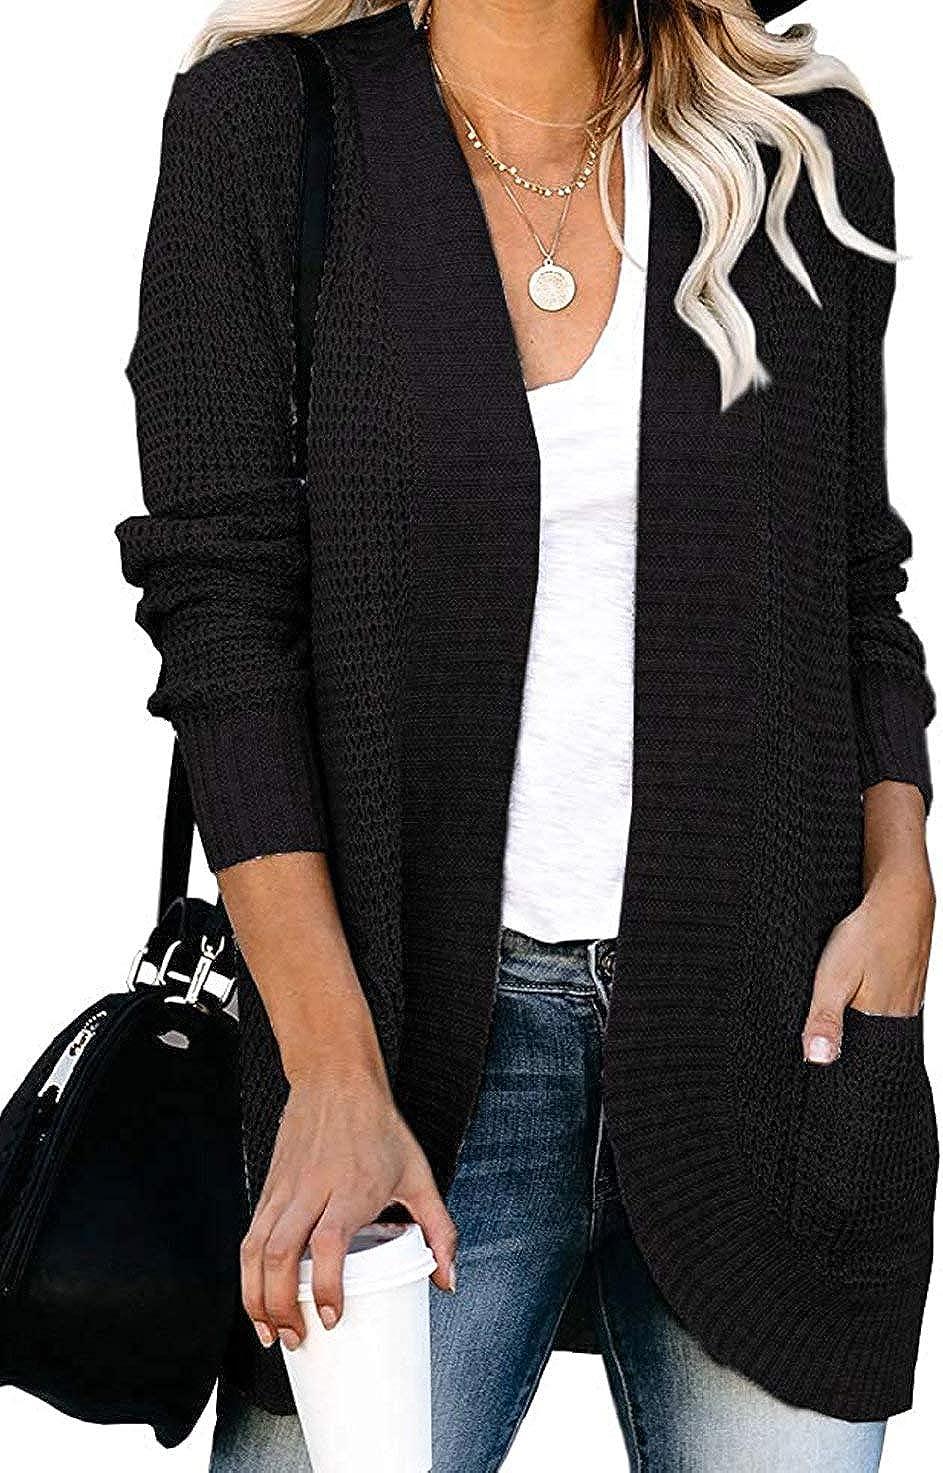 VIMPUNEC Womens Cable Cheap sale free shipping Knit Chunky Sleev Long Cardigans Boyfriend